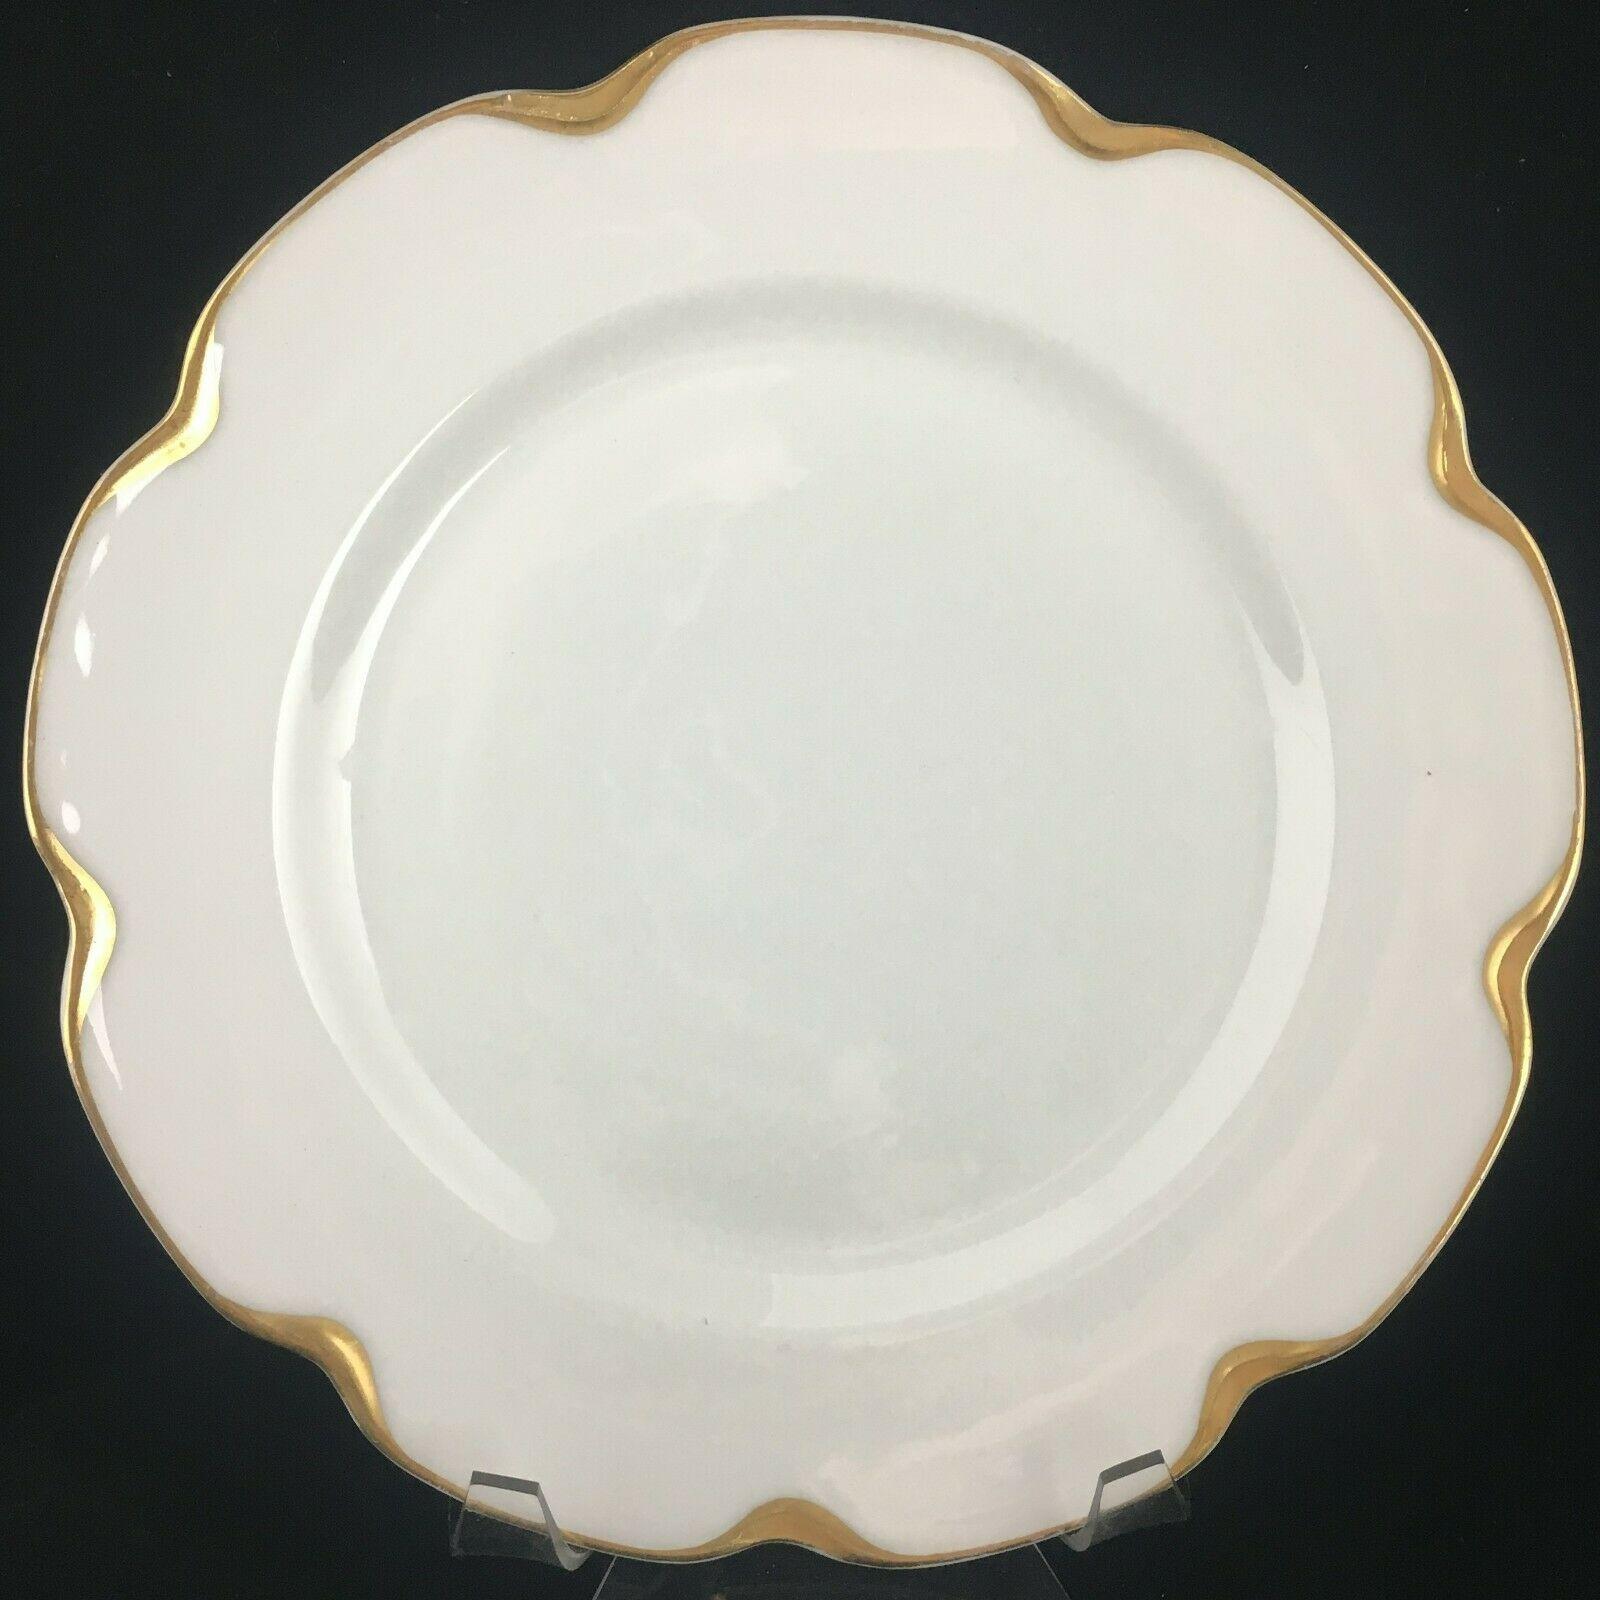 Haviland Limoges Schleiger 19 Silver Anniversary Dinner plate - $20.00